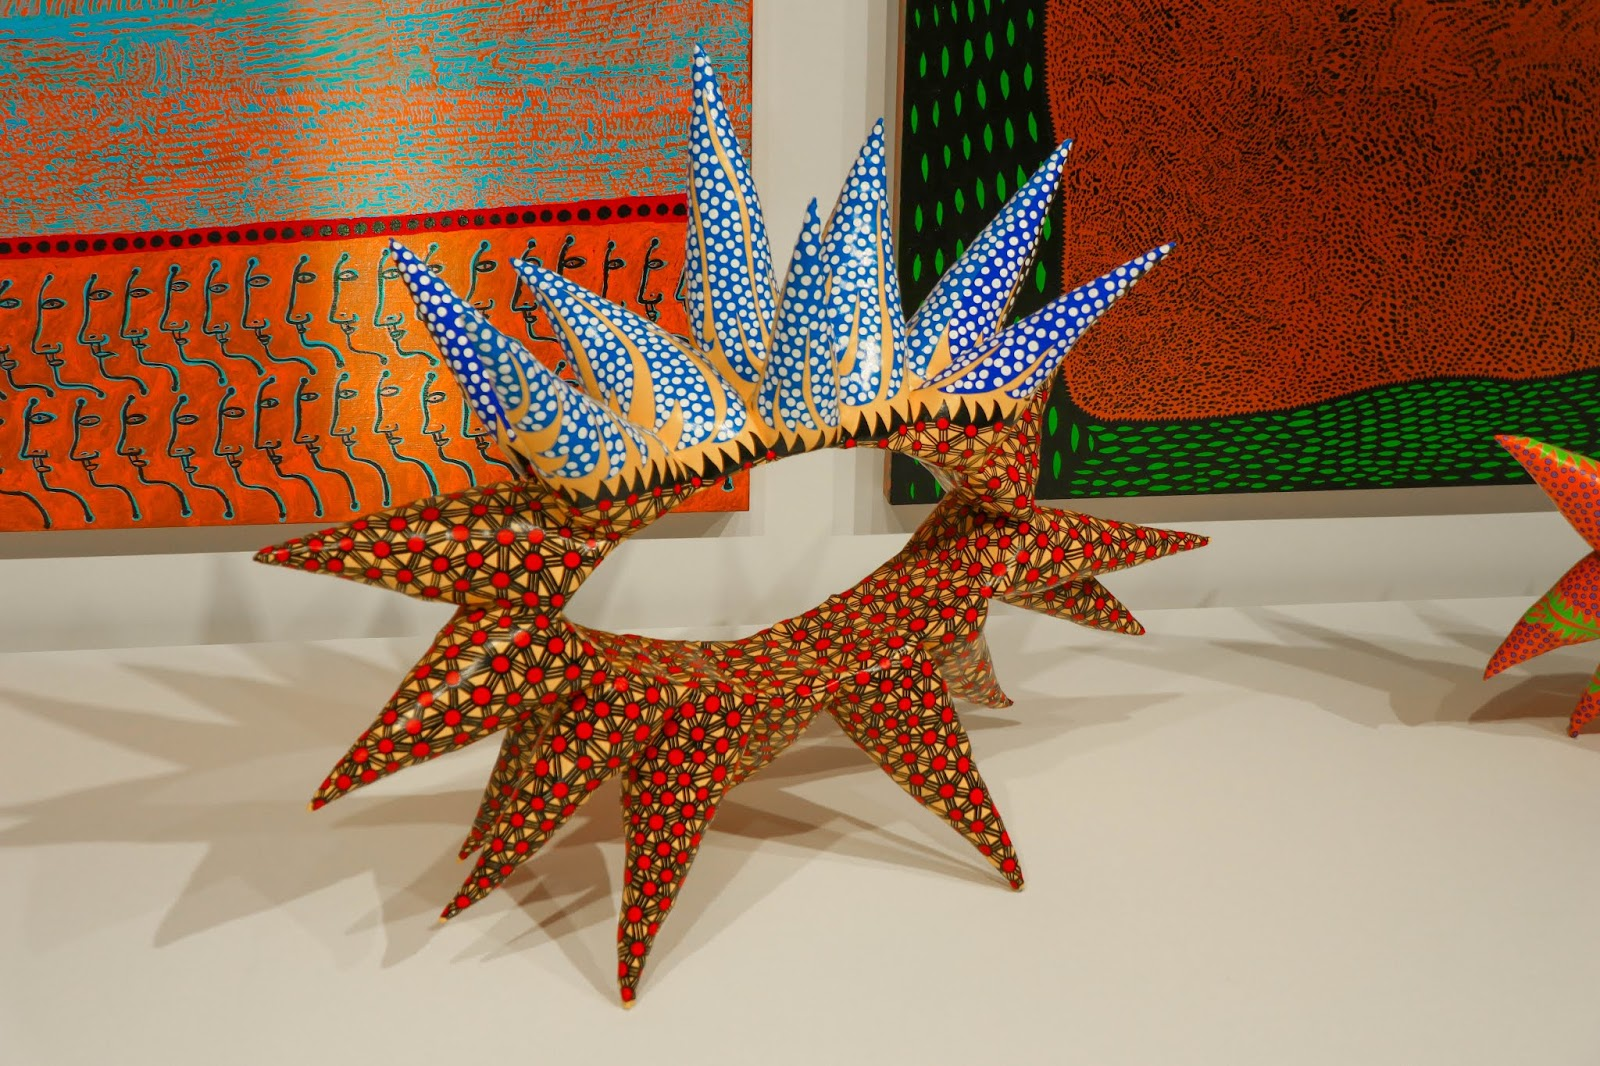 Yayoi Kusama Infinity Mirrors Photos Toronto Exhibit Paintings